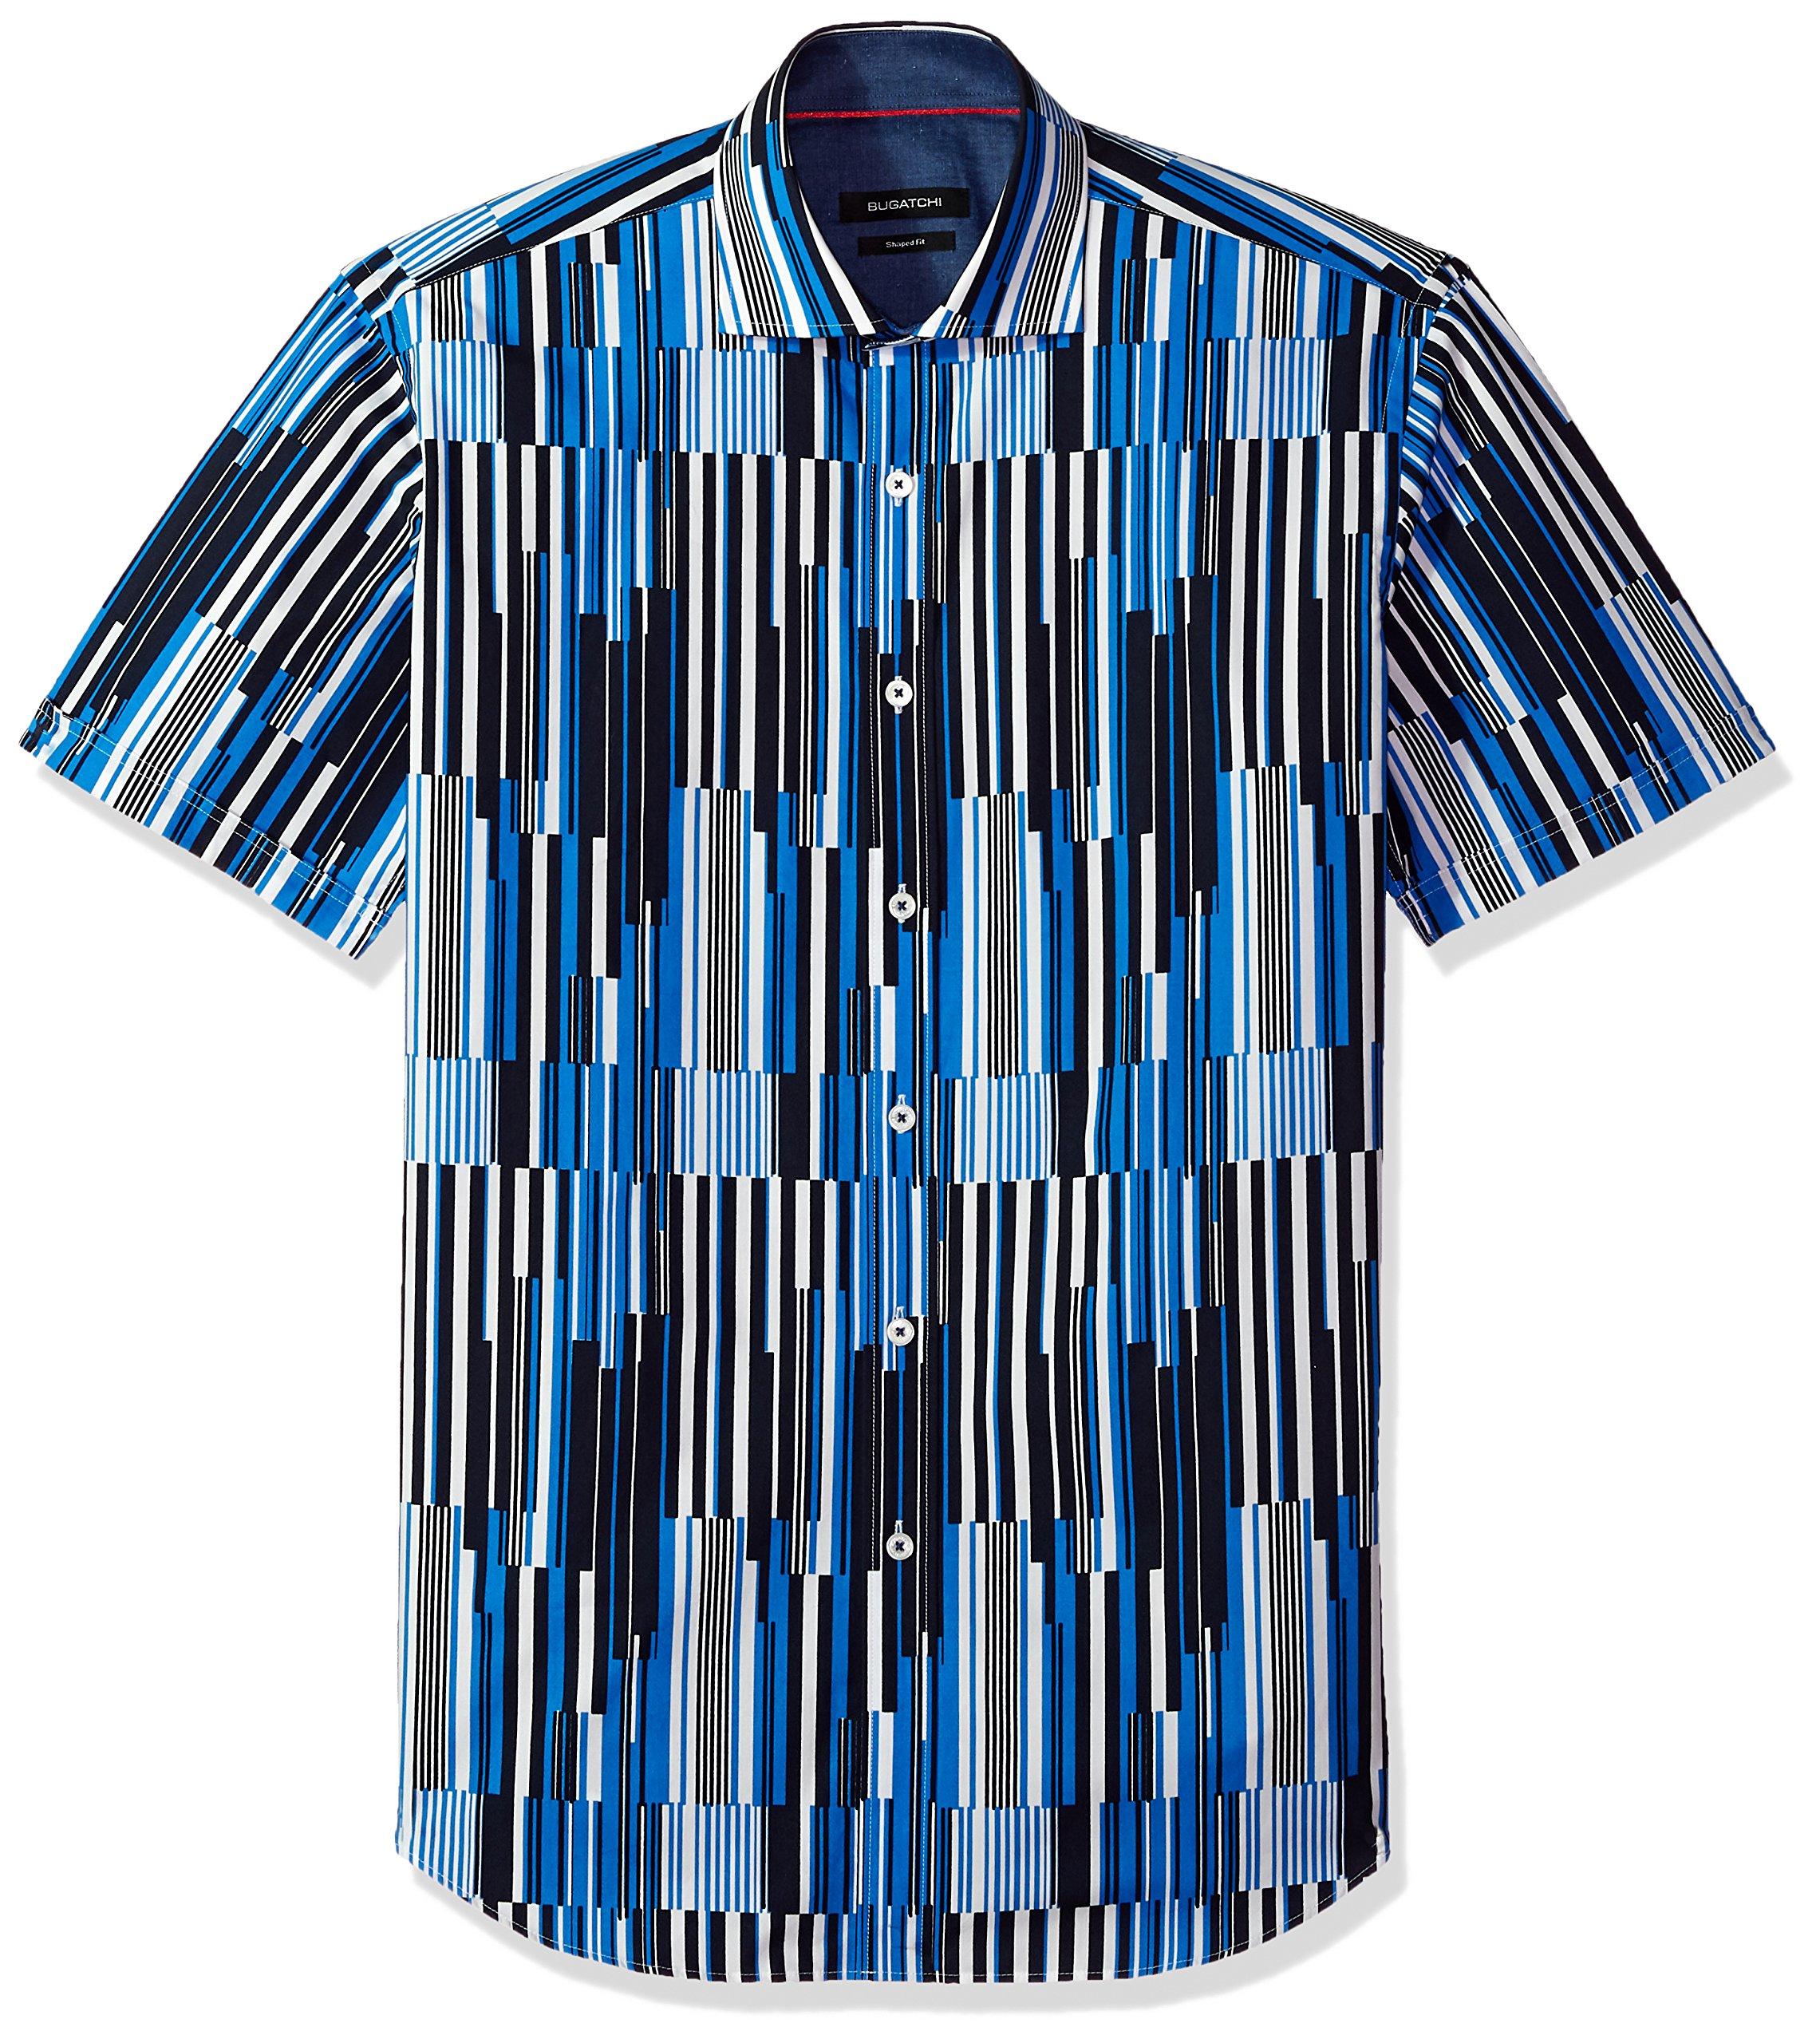 Bugatchi Men's Fitted Digital Stripes Printed Short Sleeve Cotton Shirt, Classic Blue, XXL